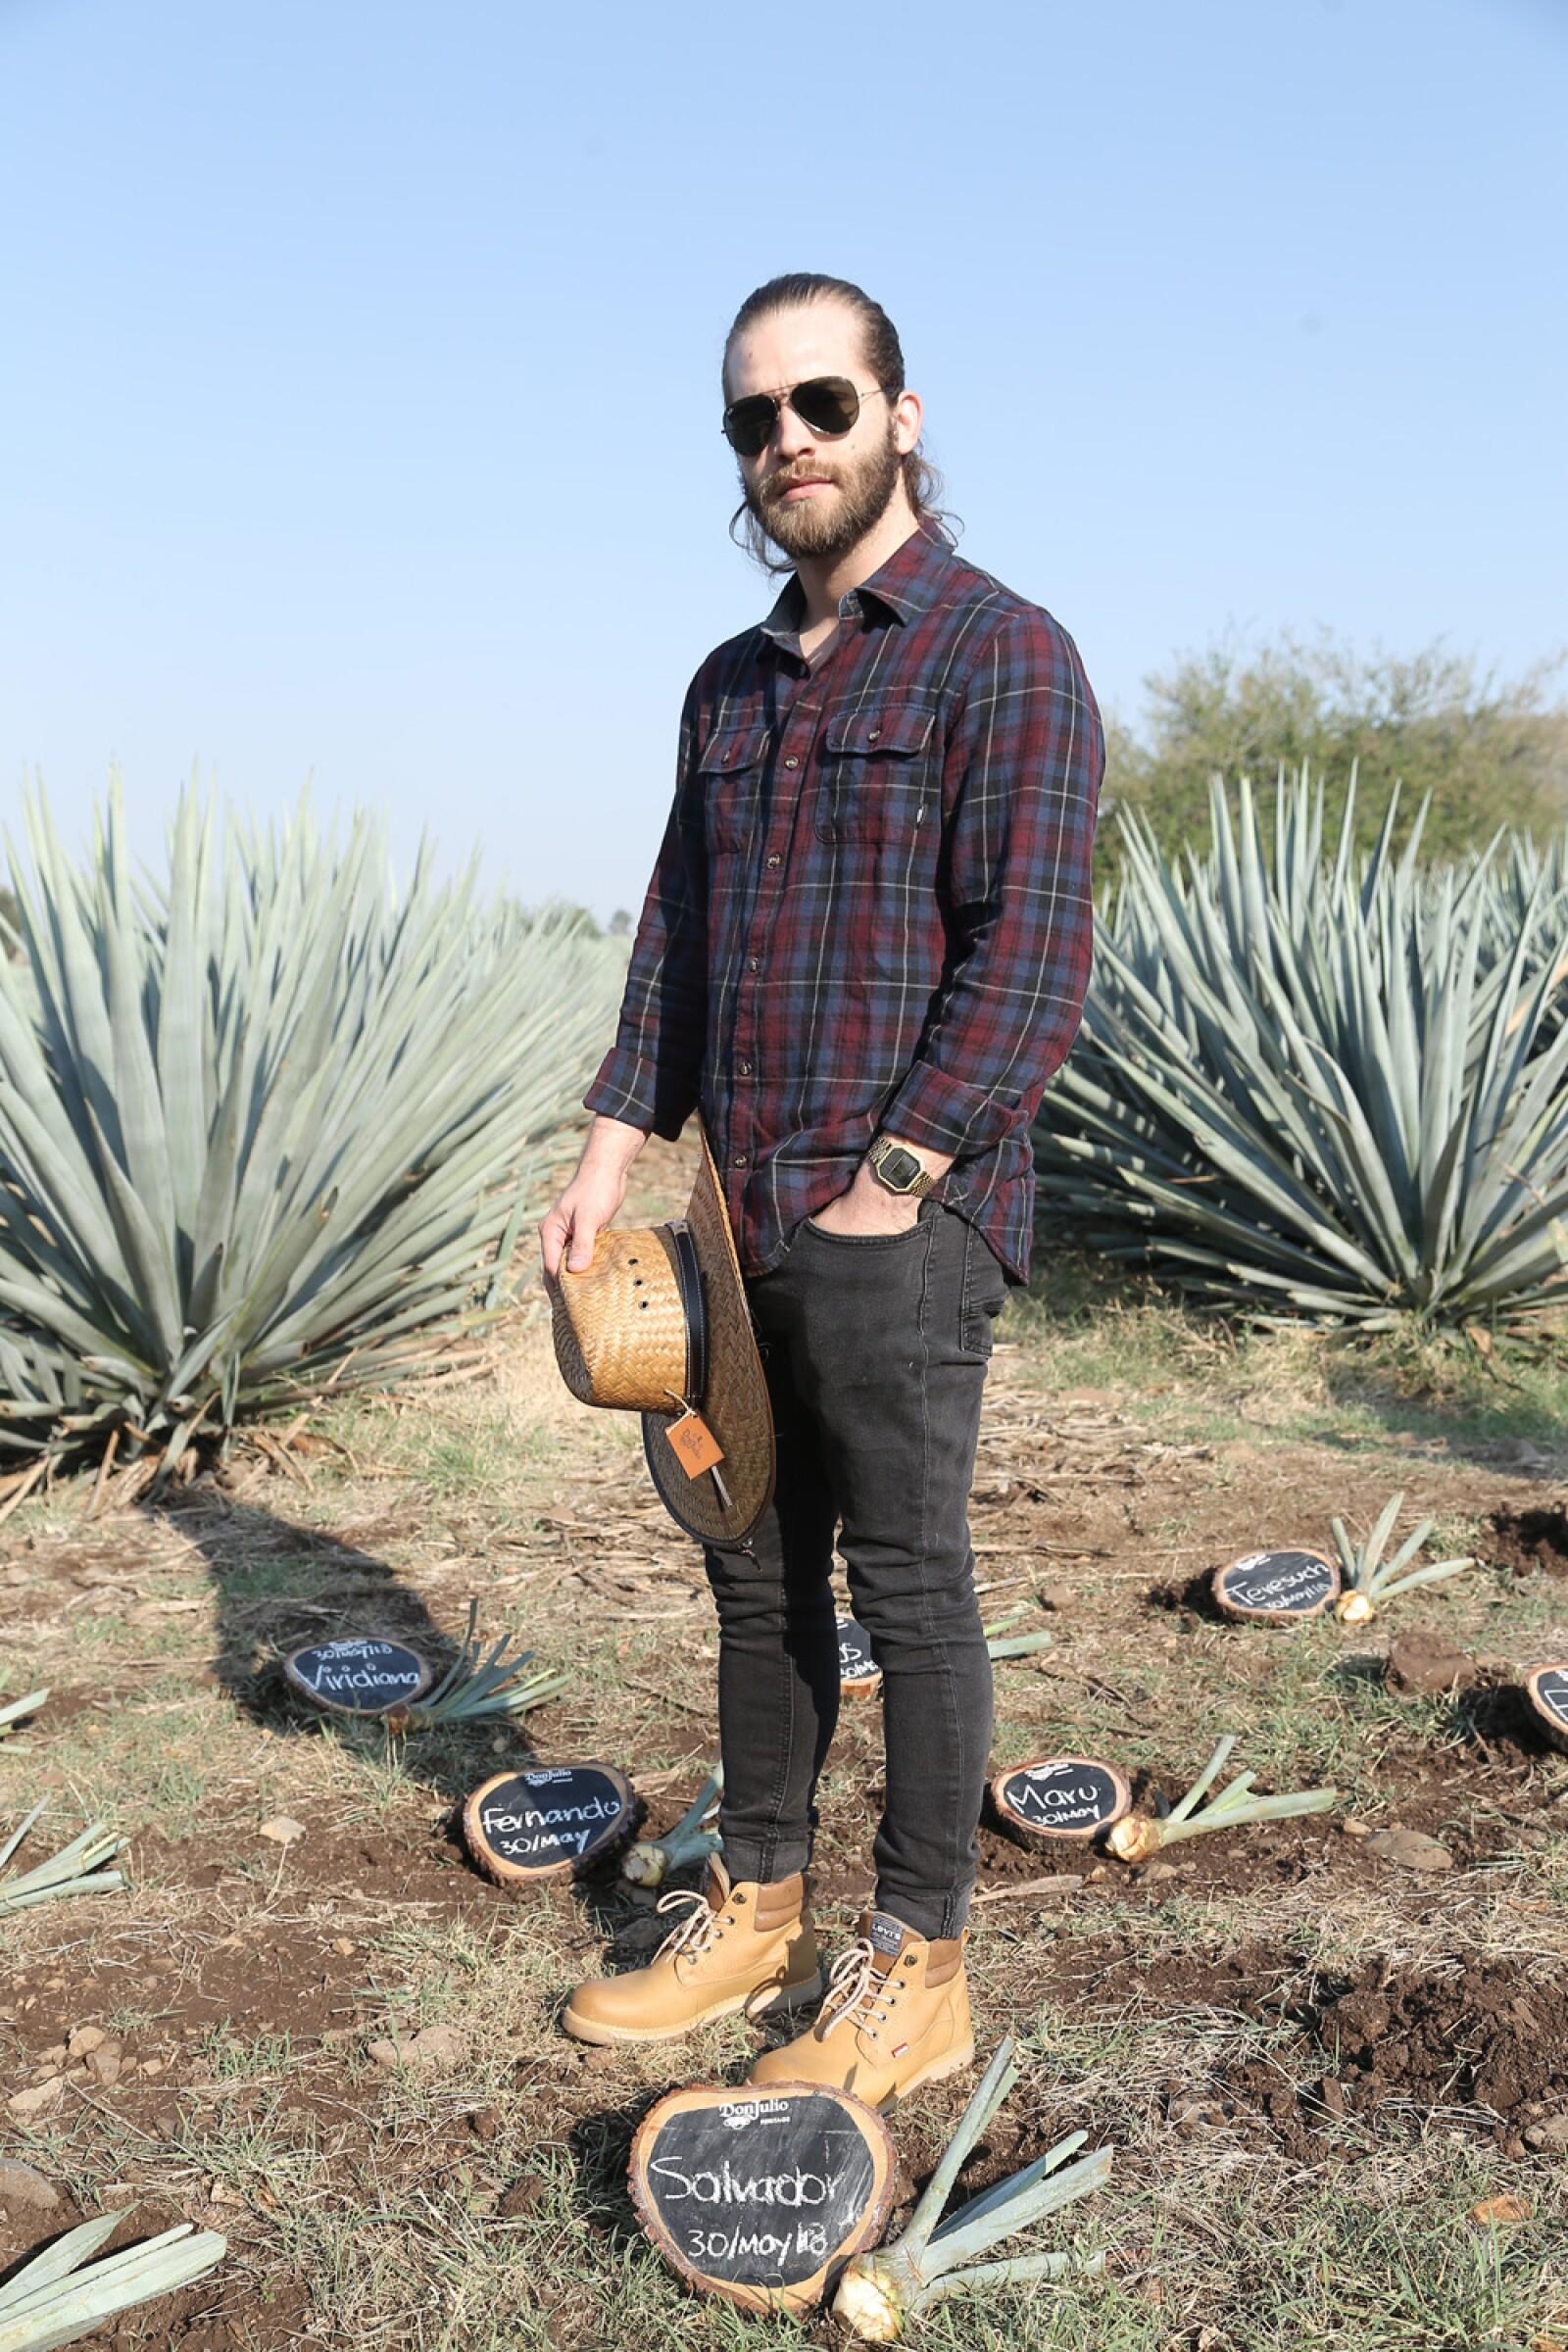 Tequila Don Julio Guadalajara